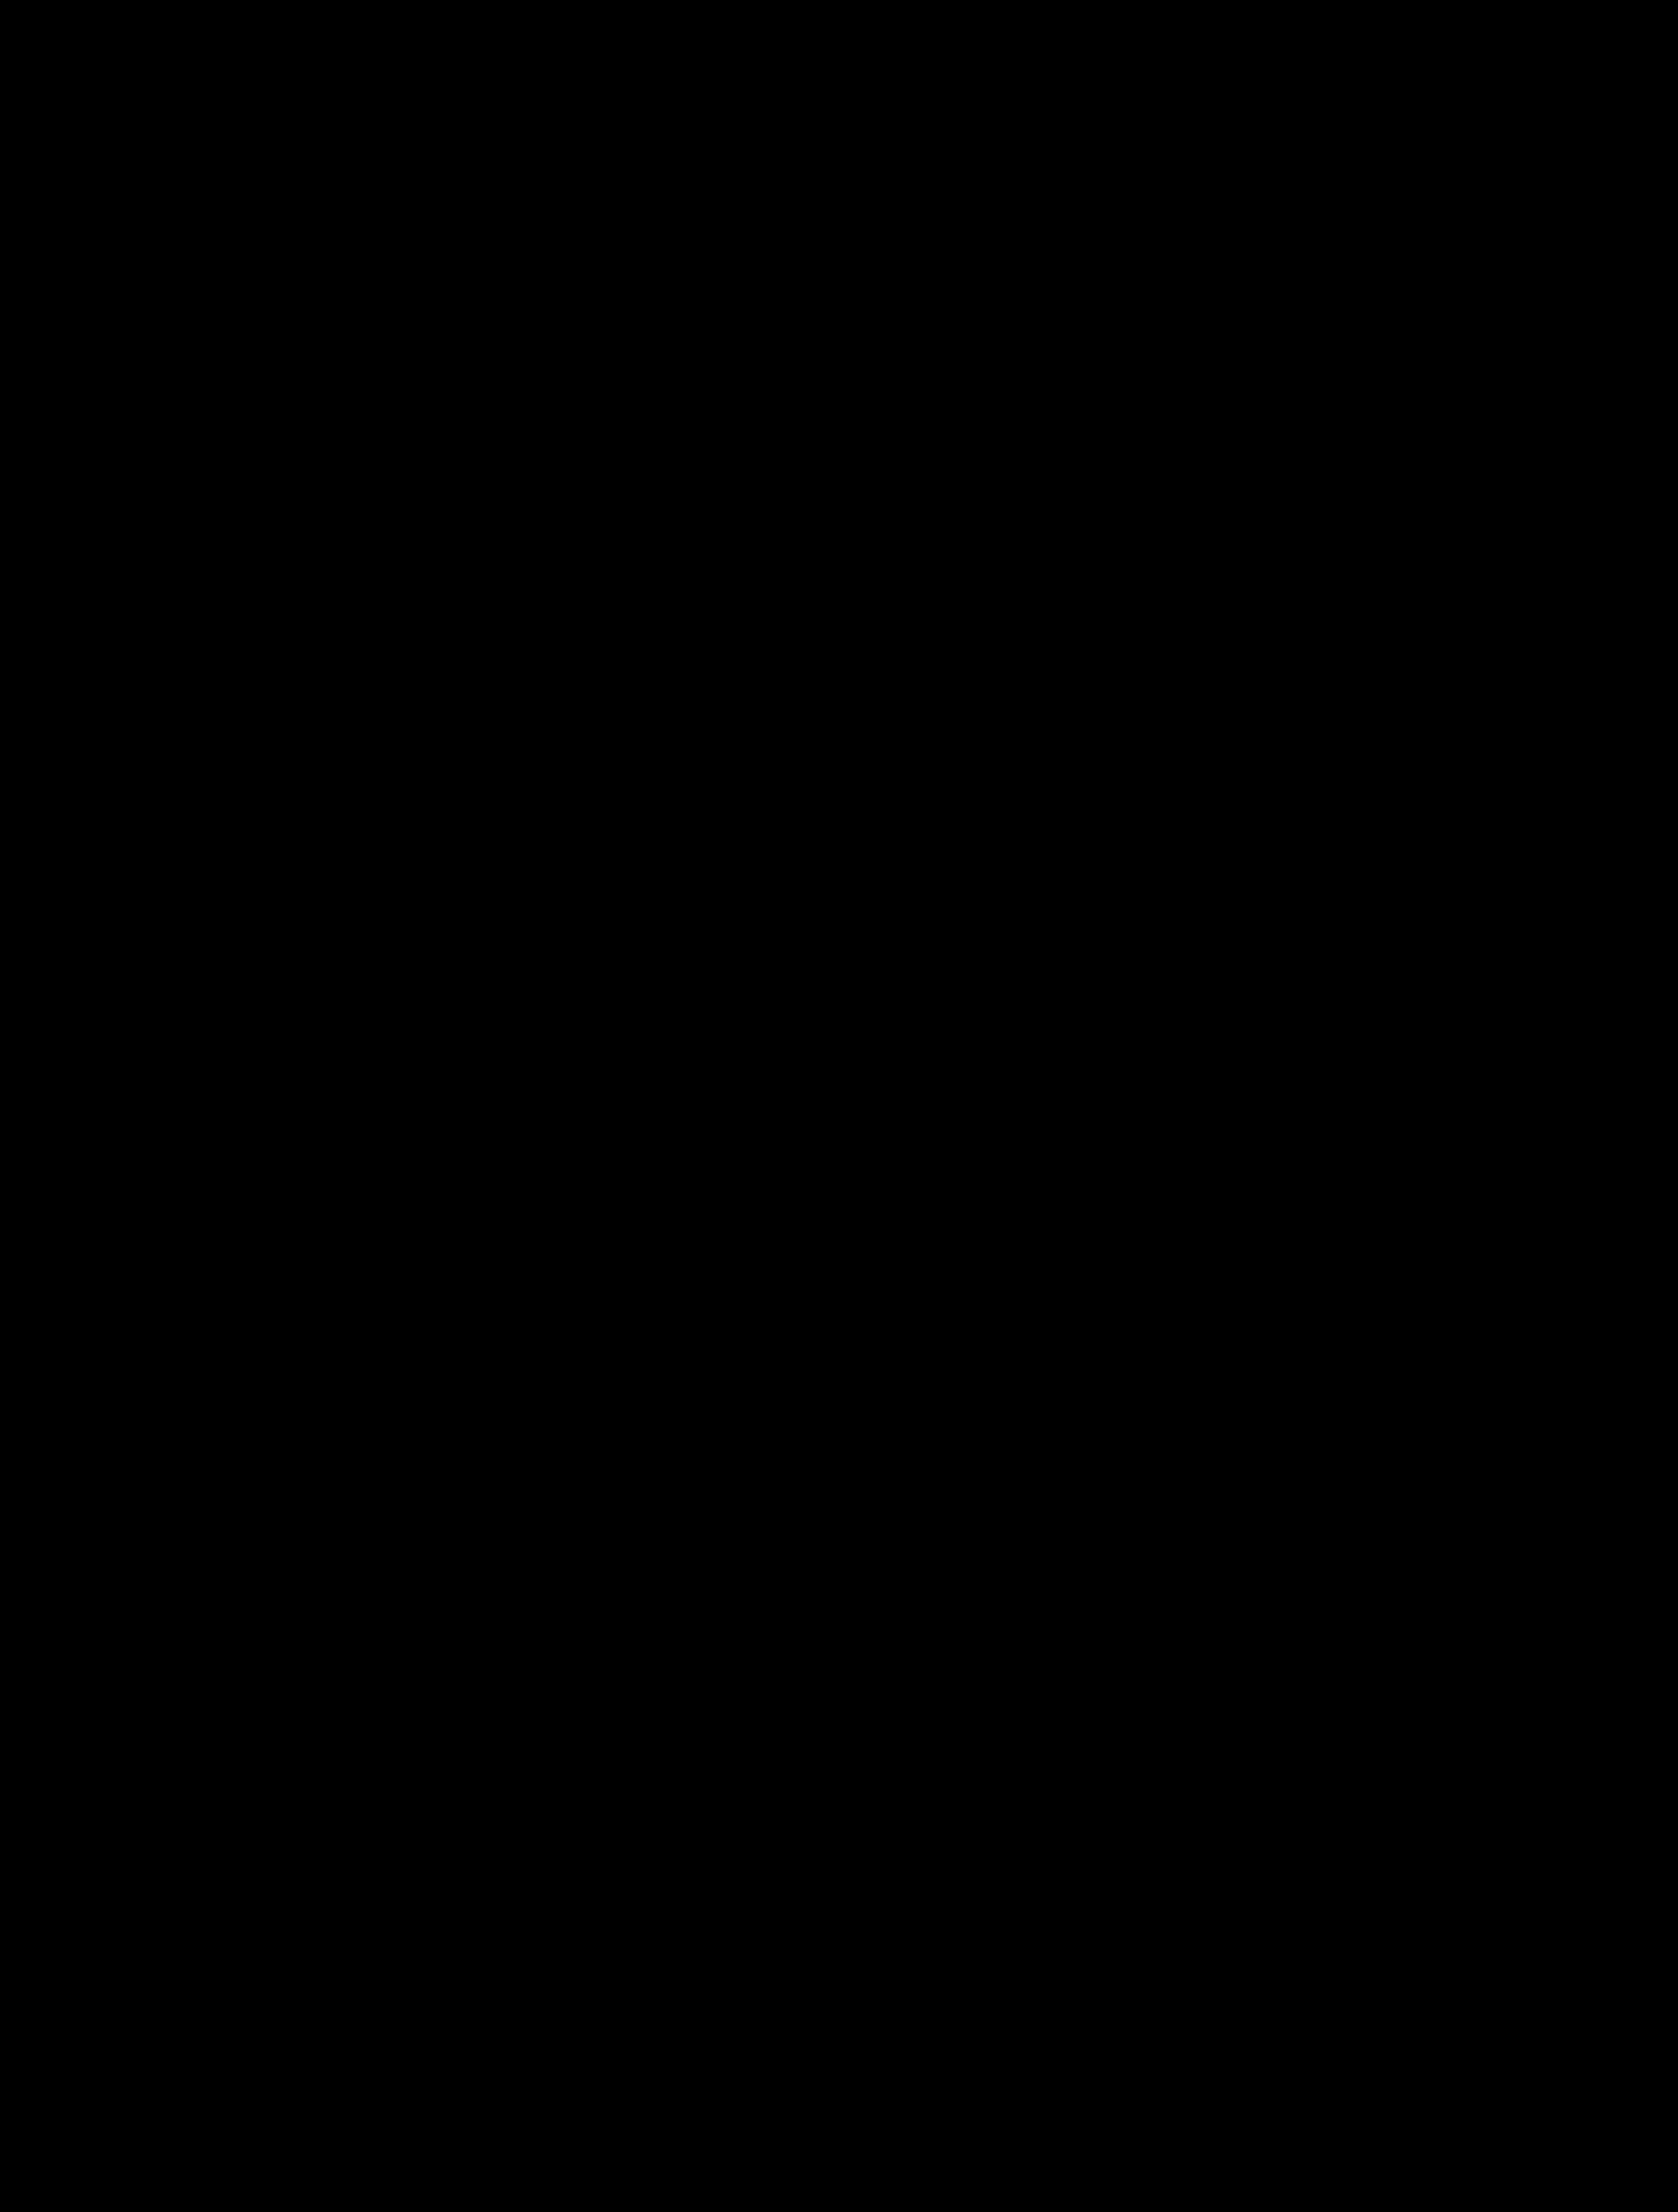 Big image png. Clipart border simple